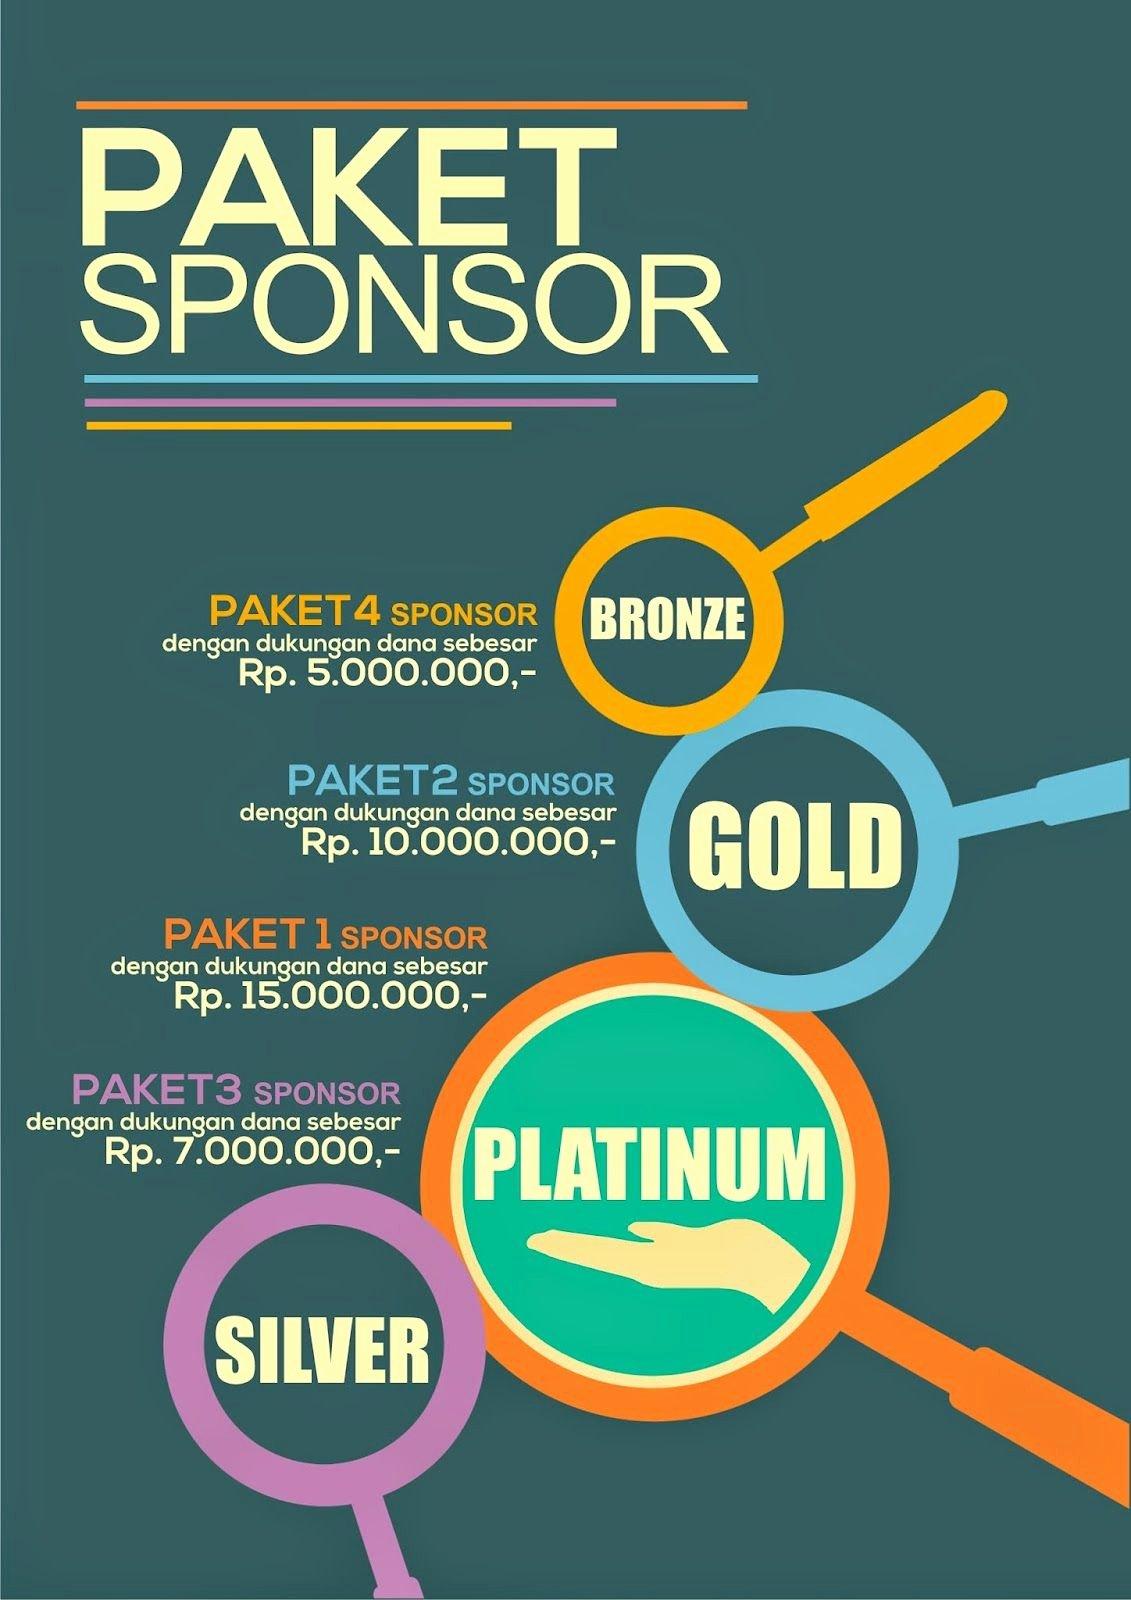 Sponsorship Packet Template Fresh Sponsorship Proposal Design Google Search